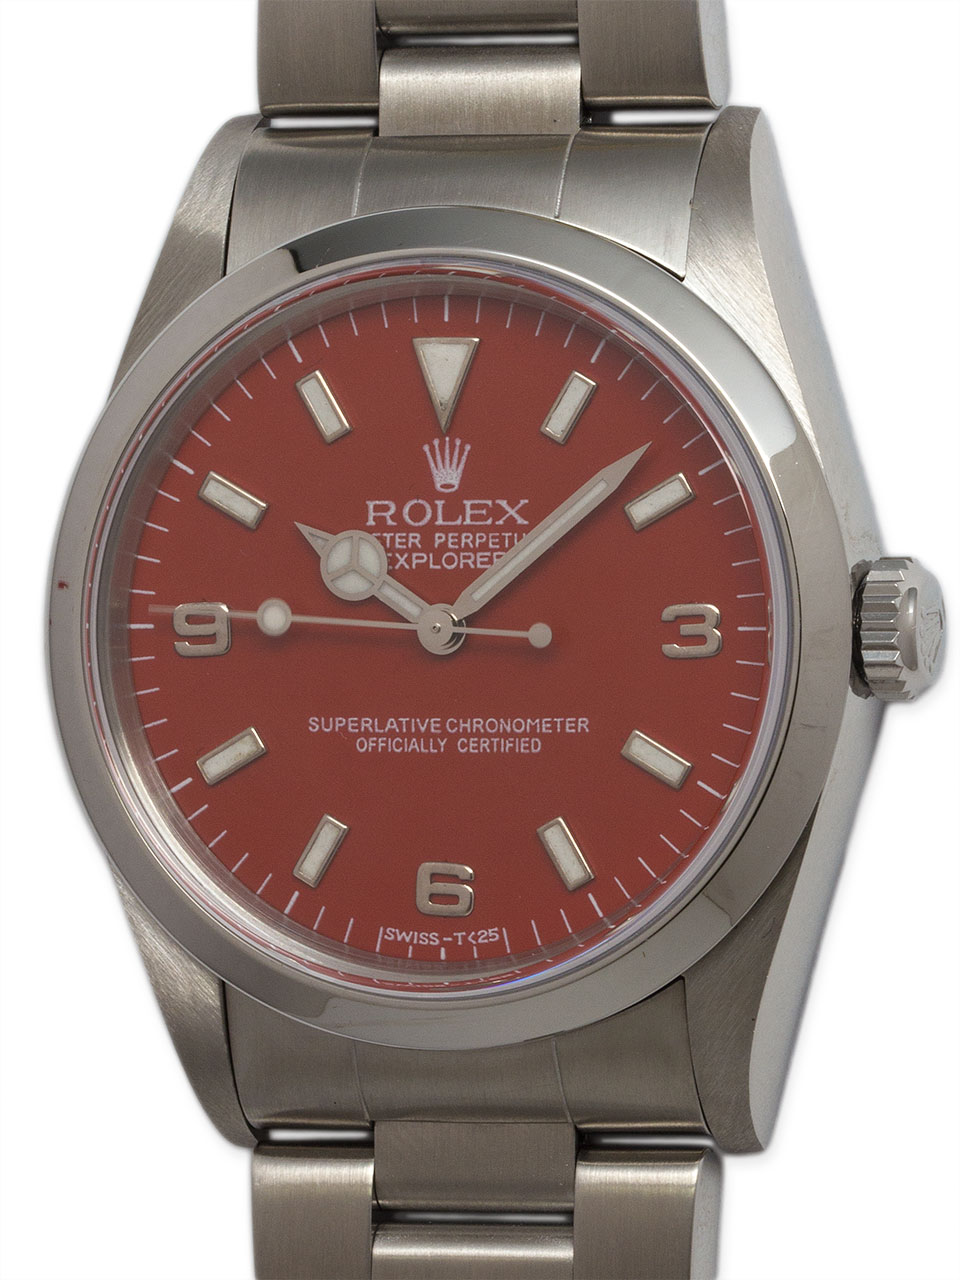 Rolex SS Explorer 1 ref 14270 circa 1998 Apple Red